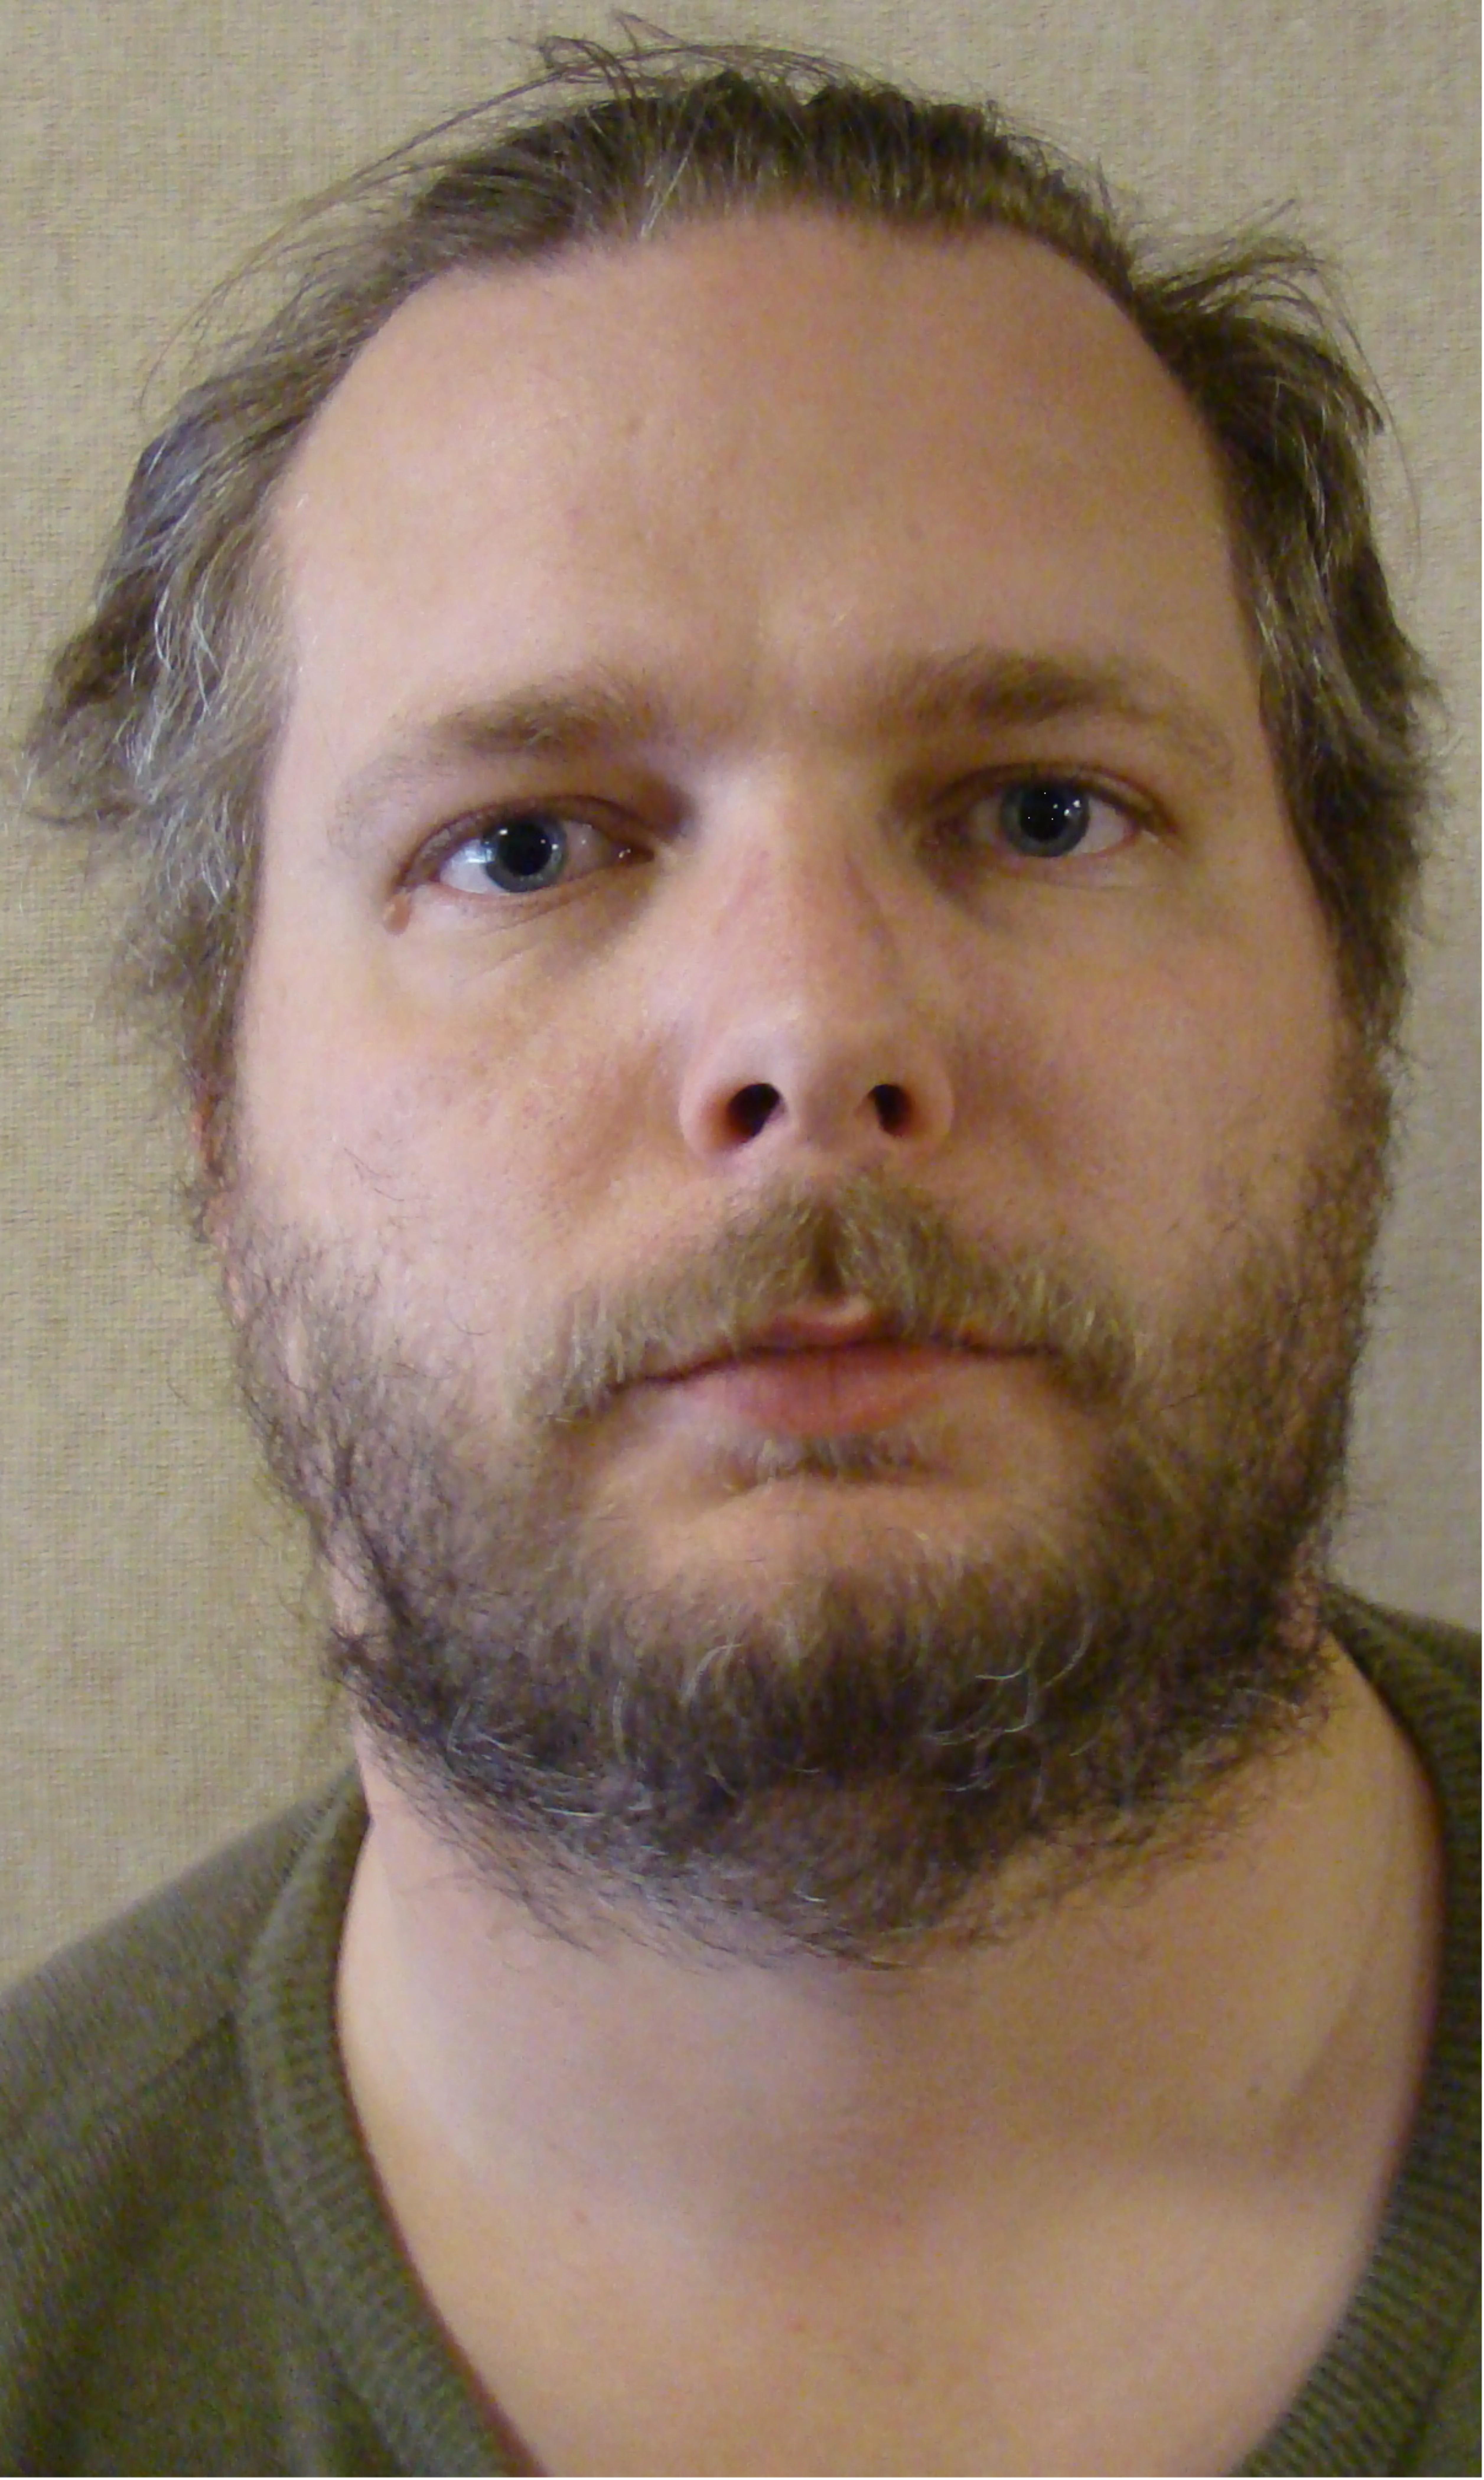 arapahoe county sex offender jpg 1152x768